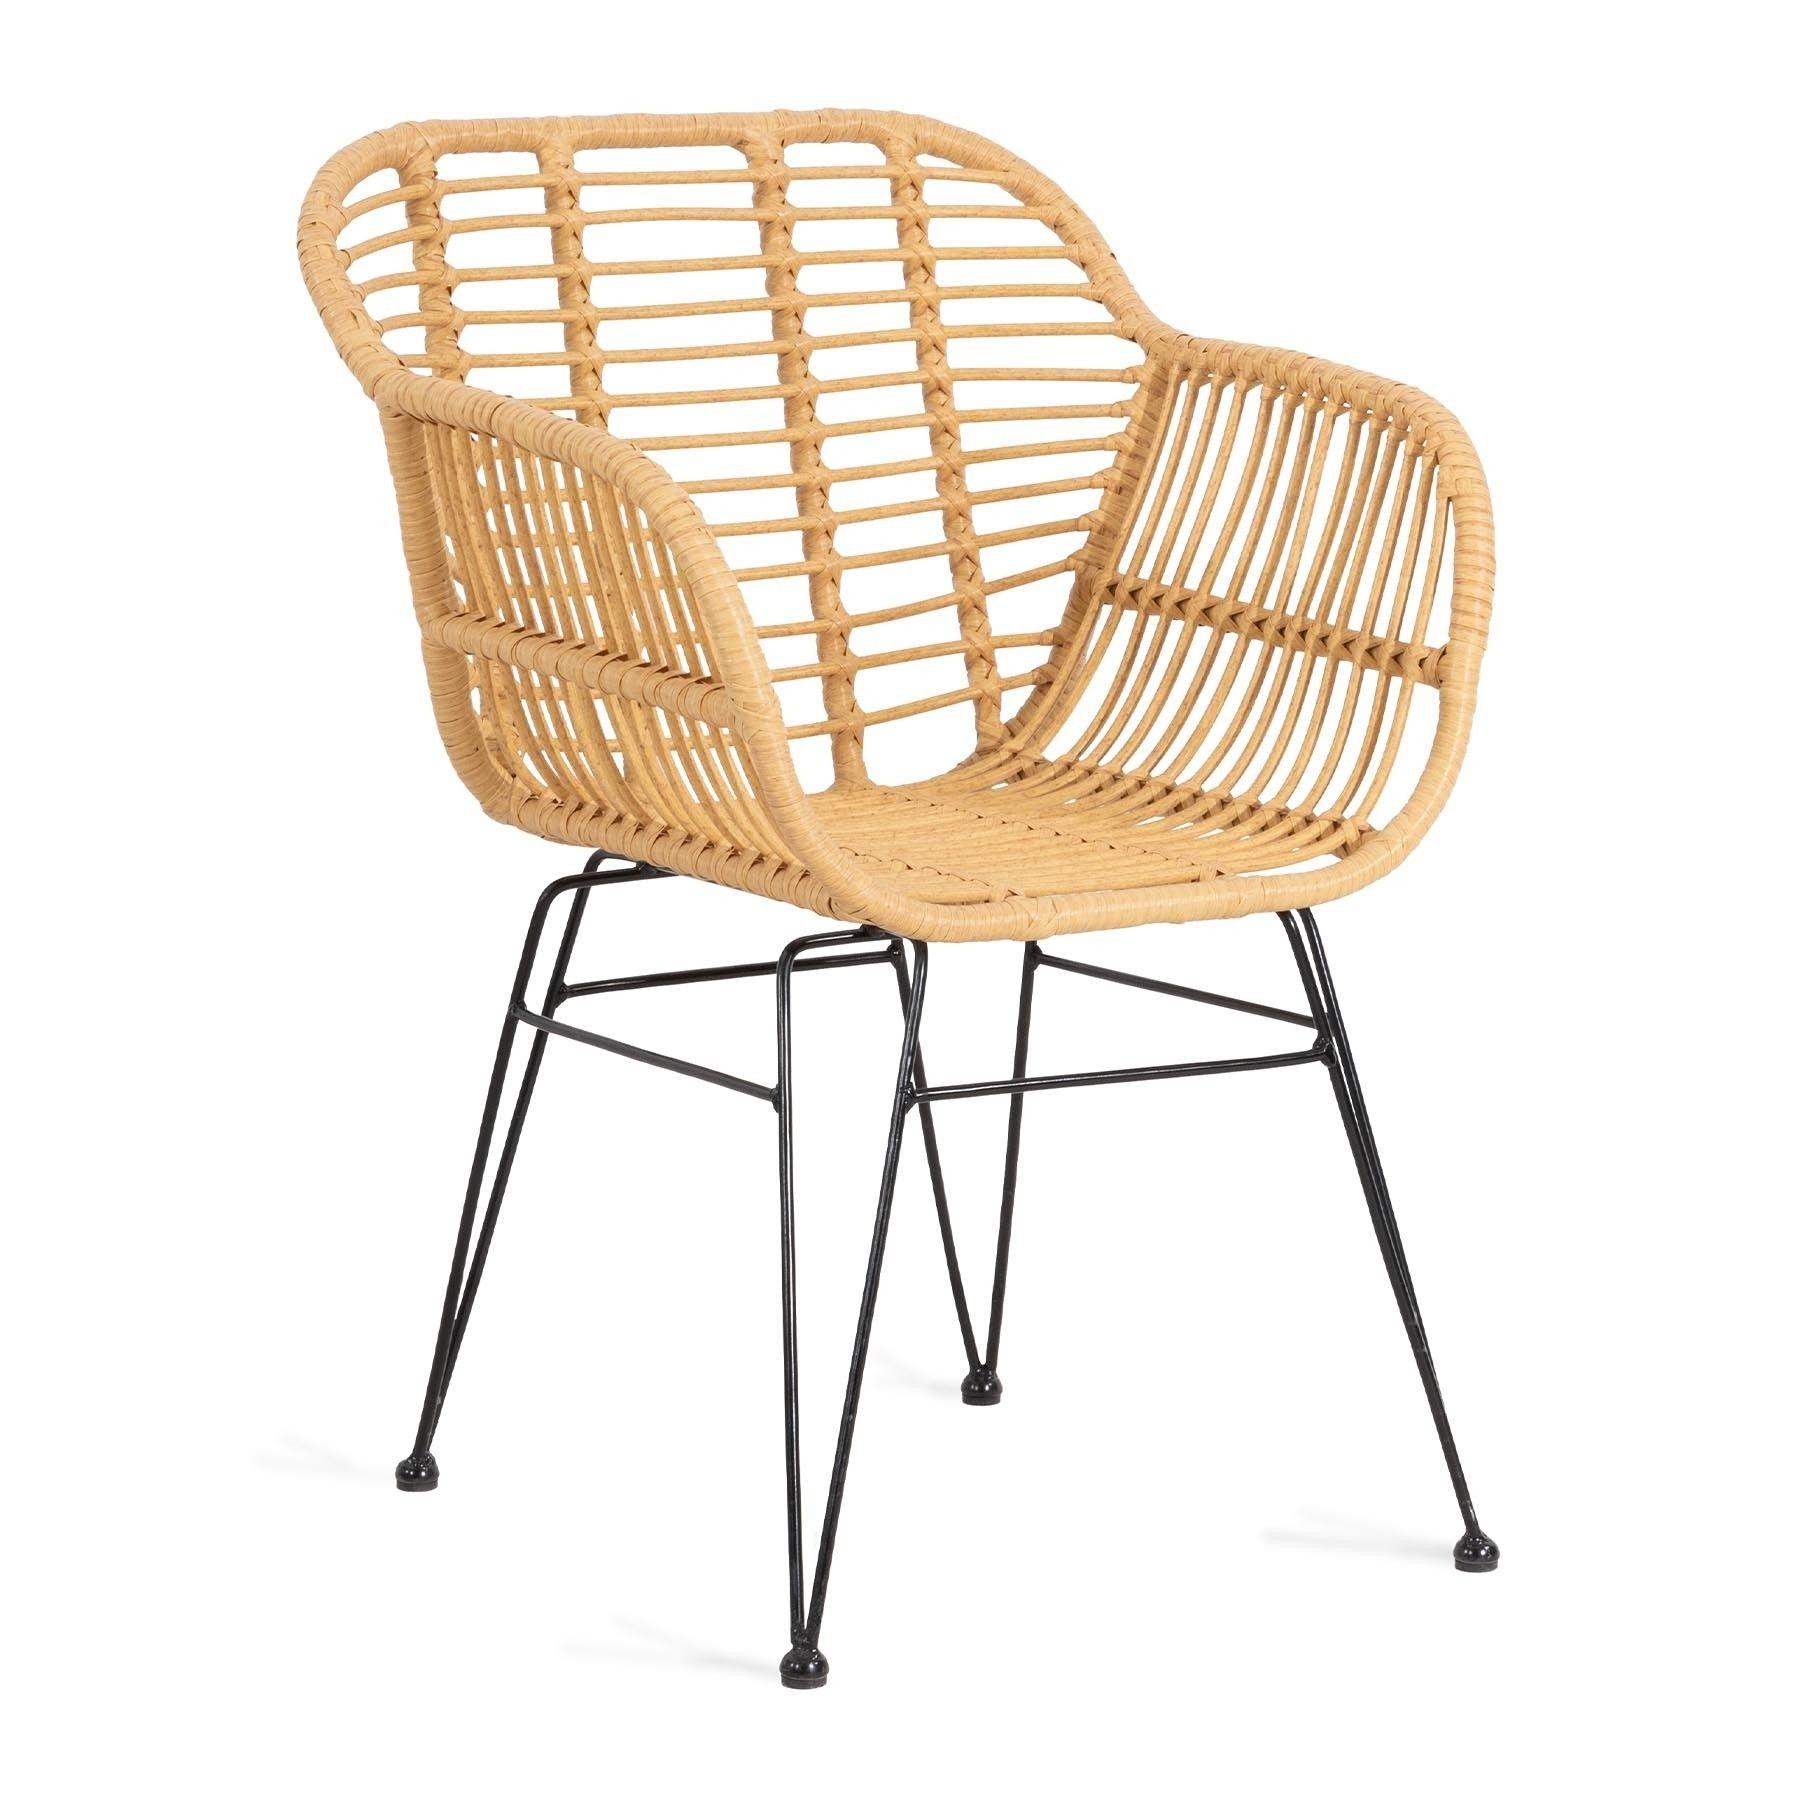 Jardin Krzeslo Plecione Naturalne 43x80x45 Cm Homla Com Pl Outdoor Chairs Saucer Chairs Wicker Chair